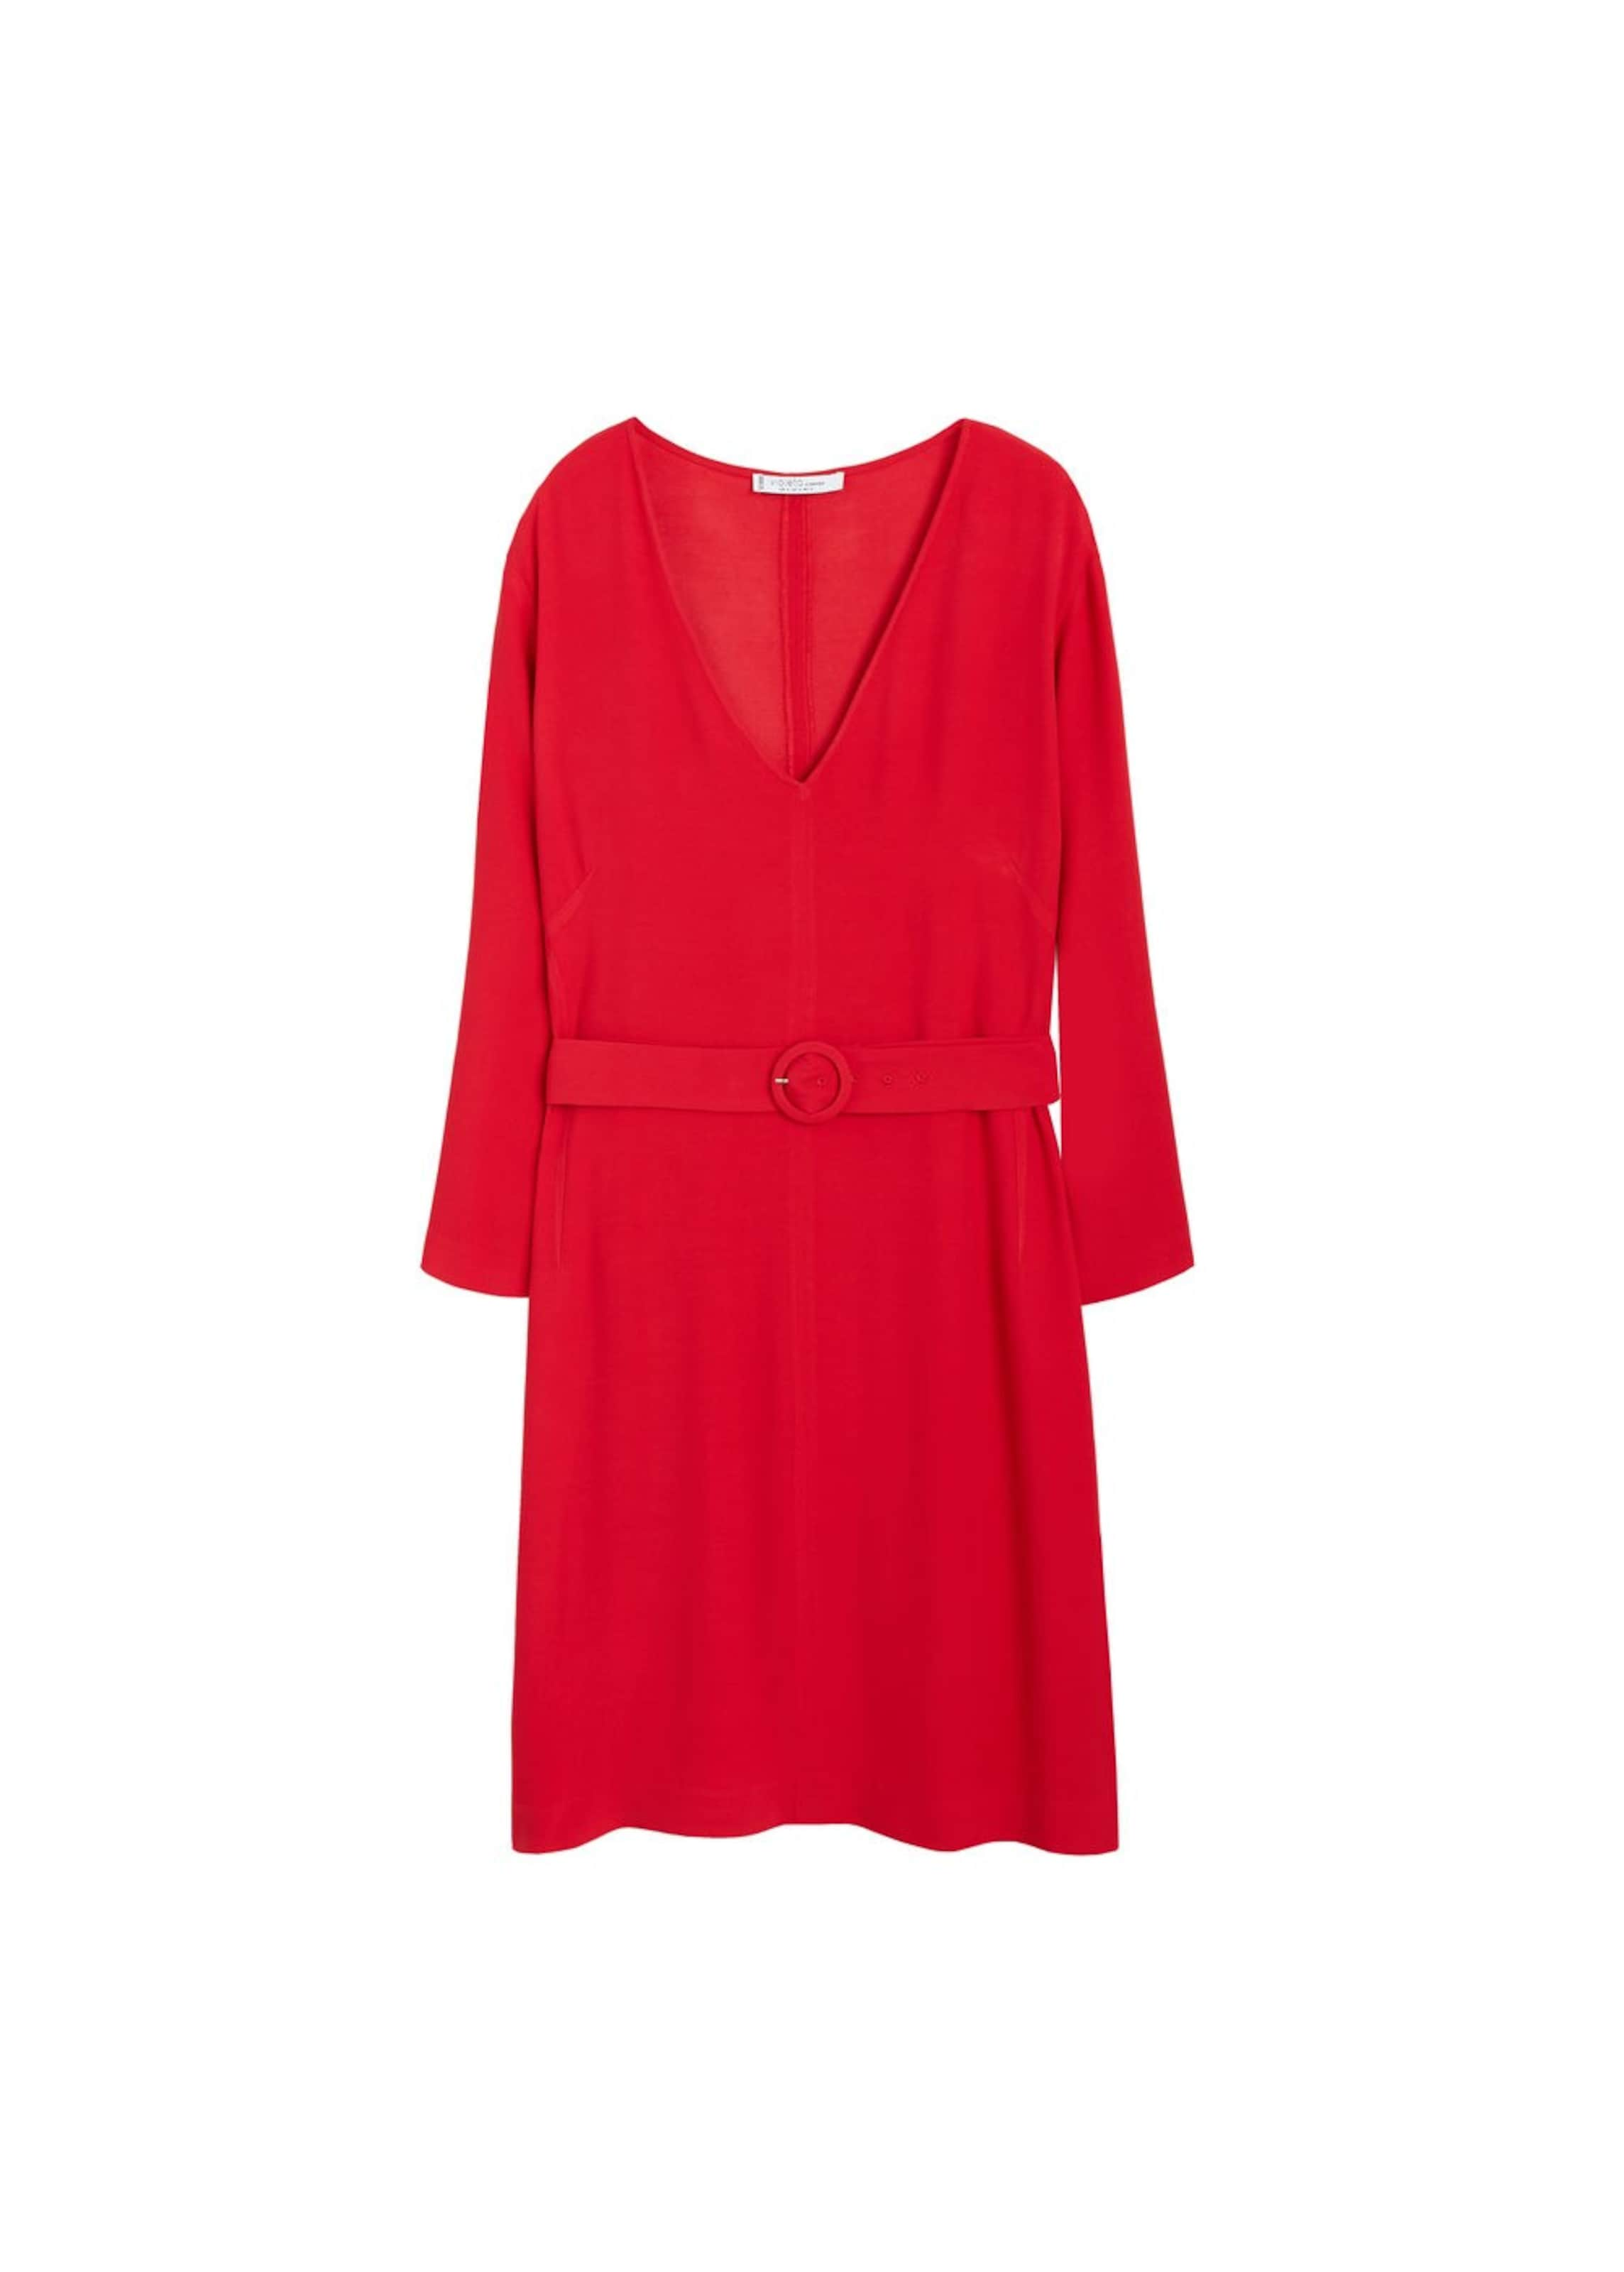 By In 'chainy5' Mango Violeta Kleid Rot A35jL4qR